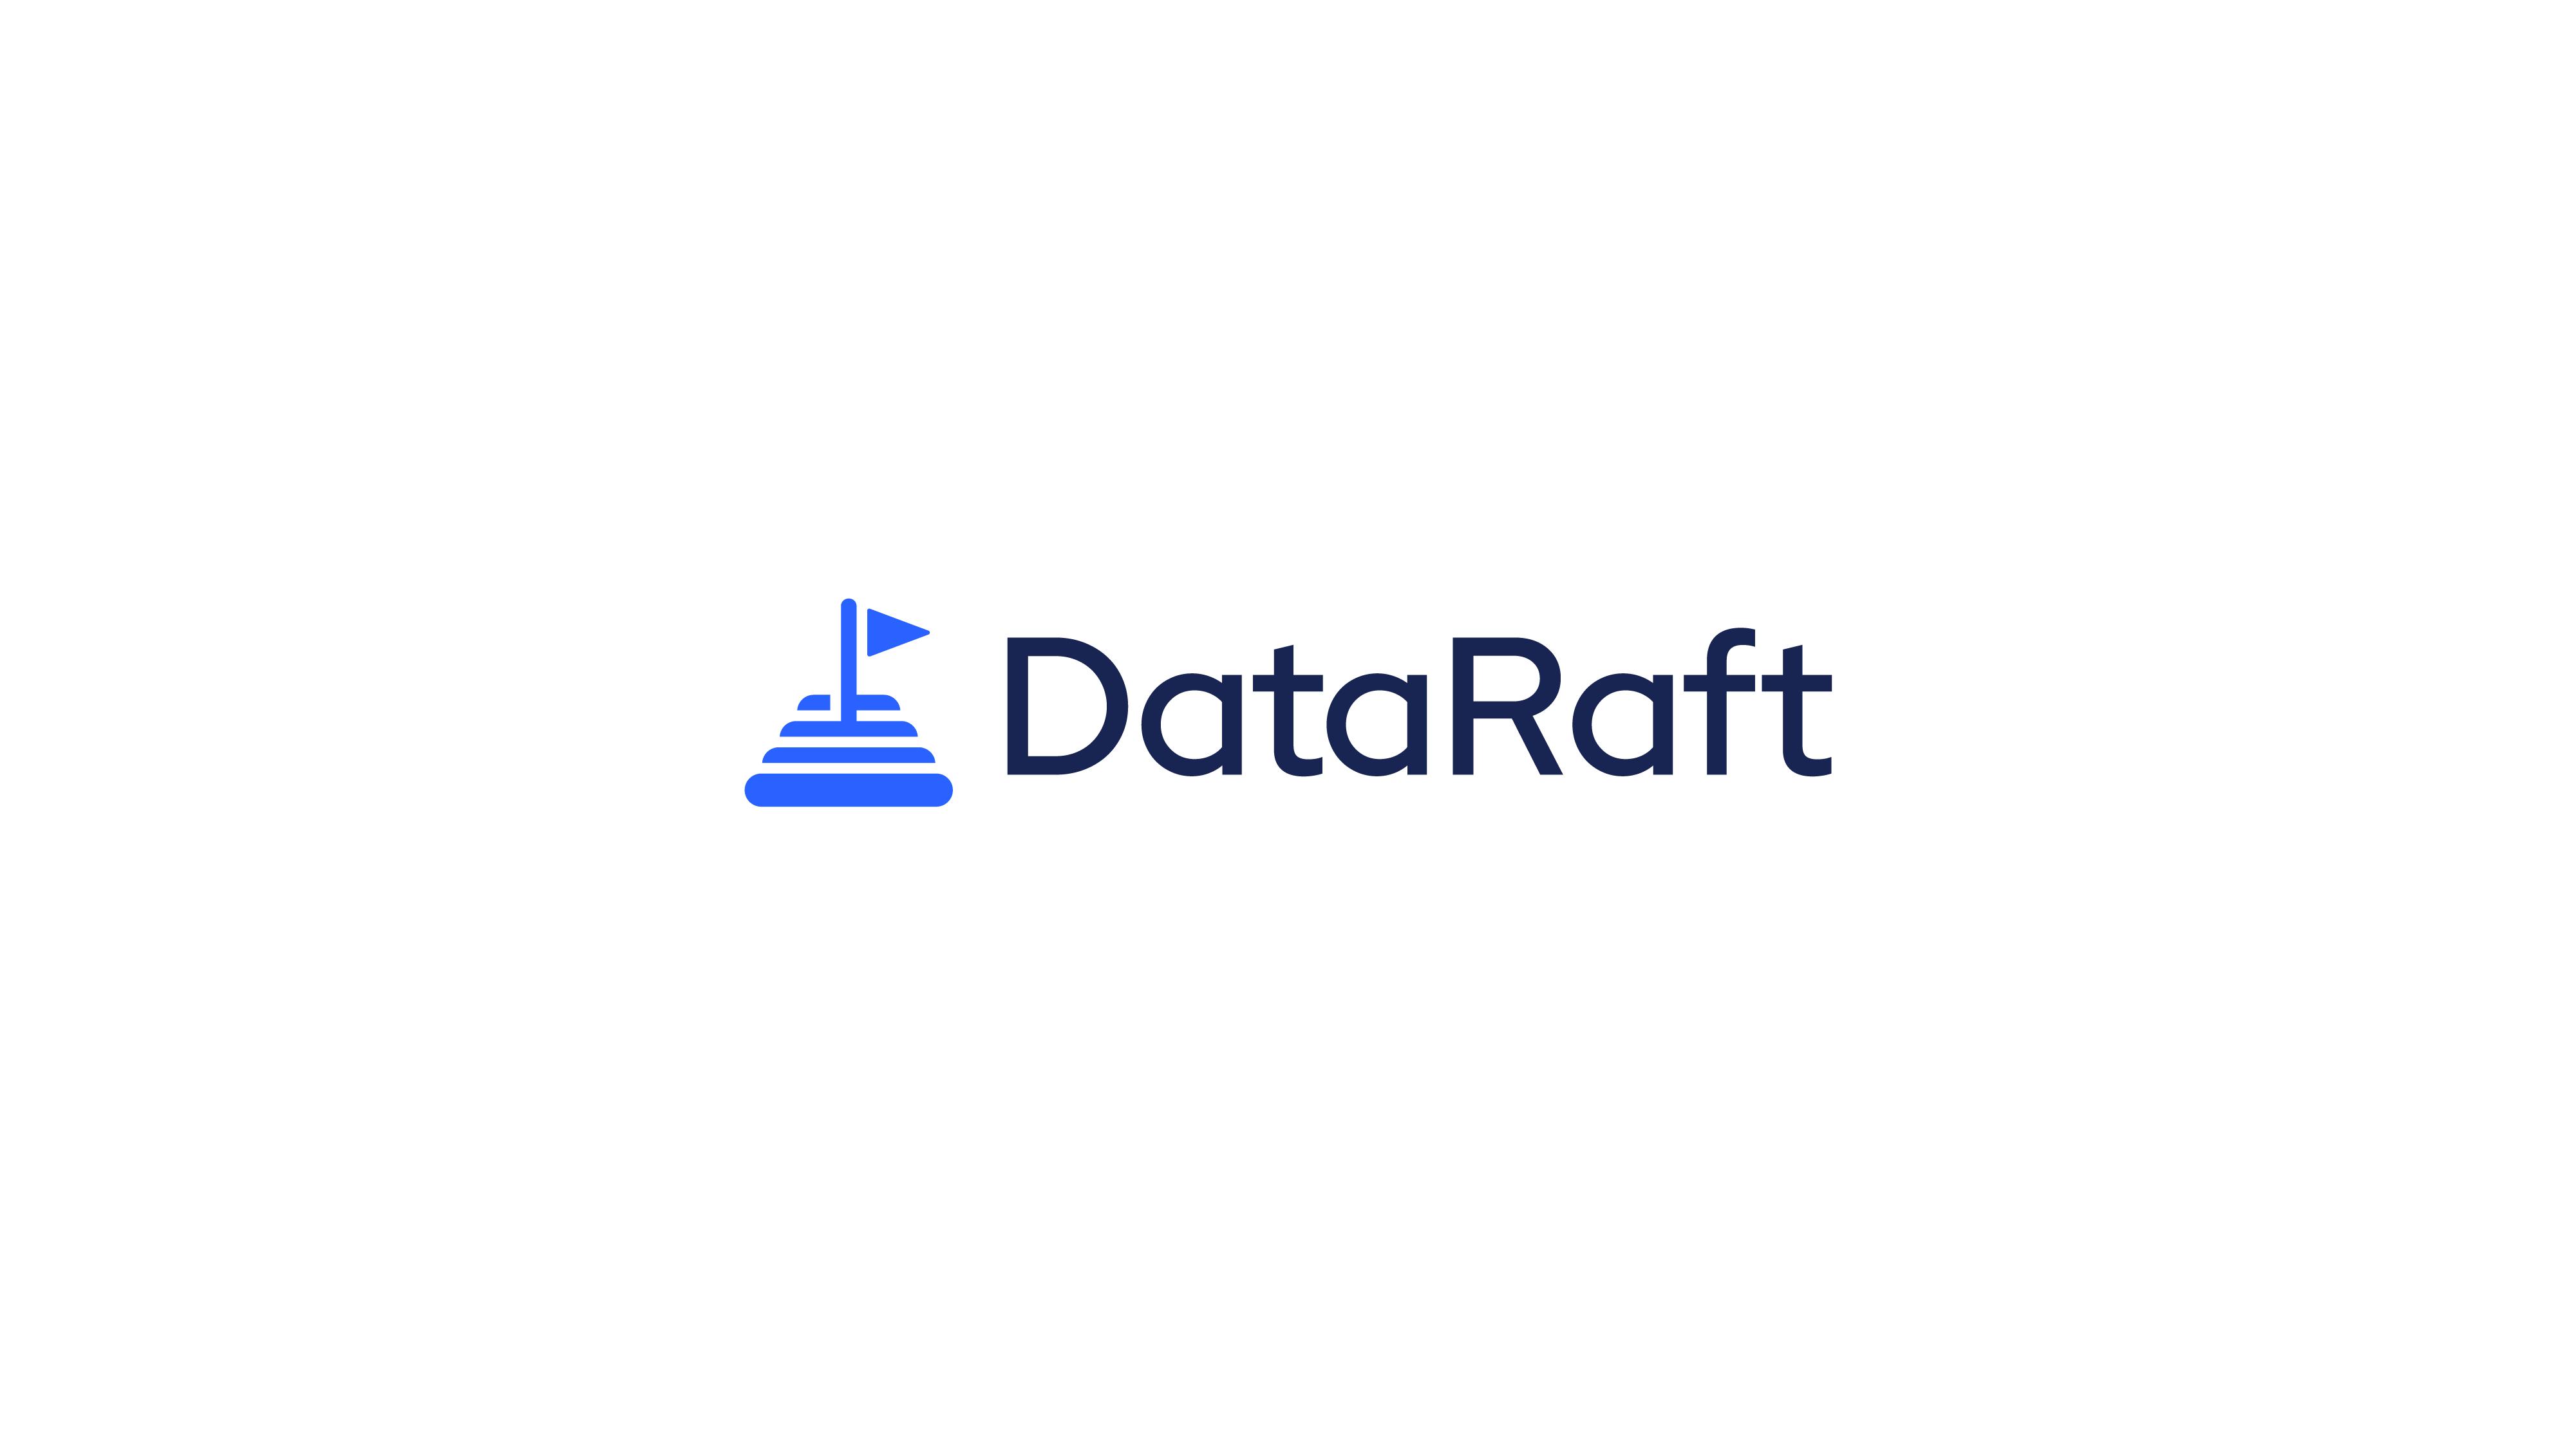 logo with raft logo